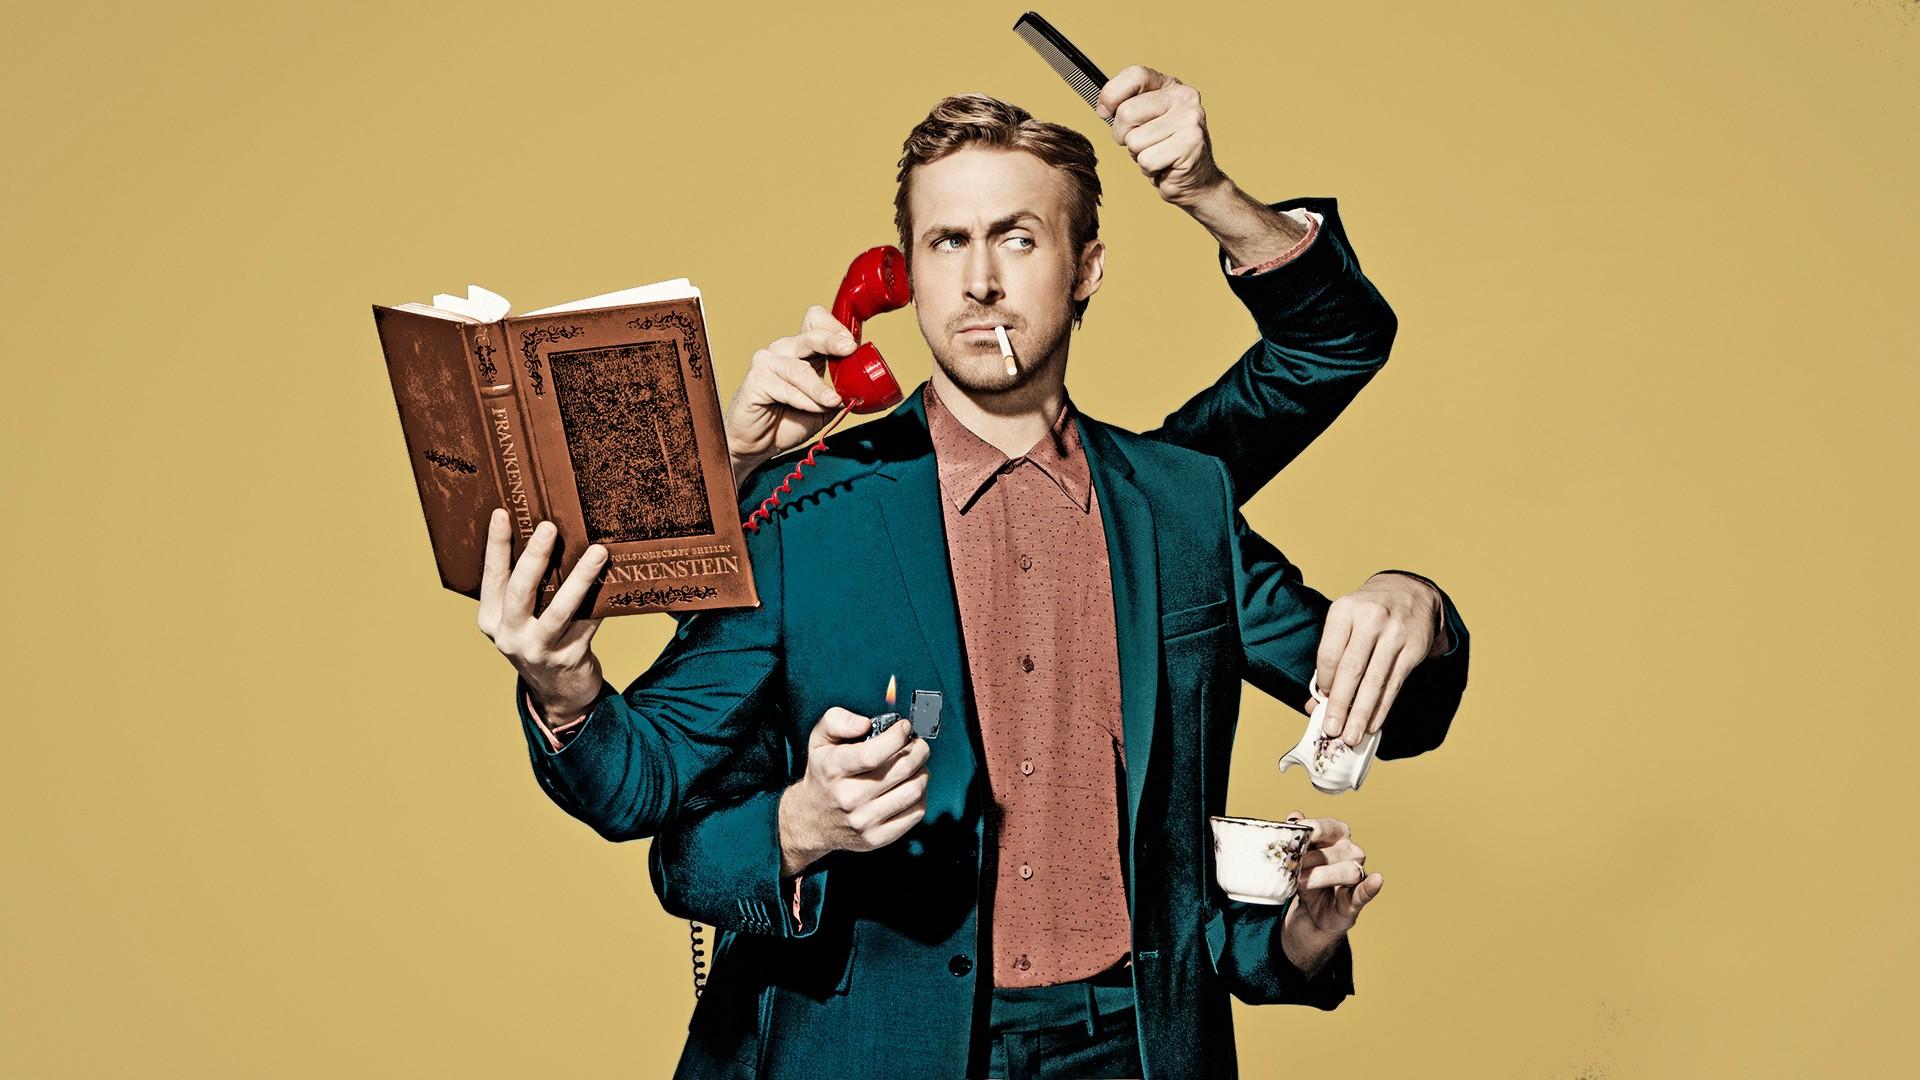 Ryan Gosling Free Wallpaper and Background